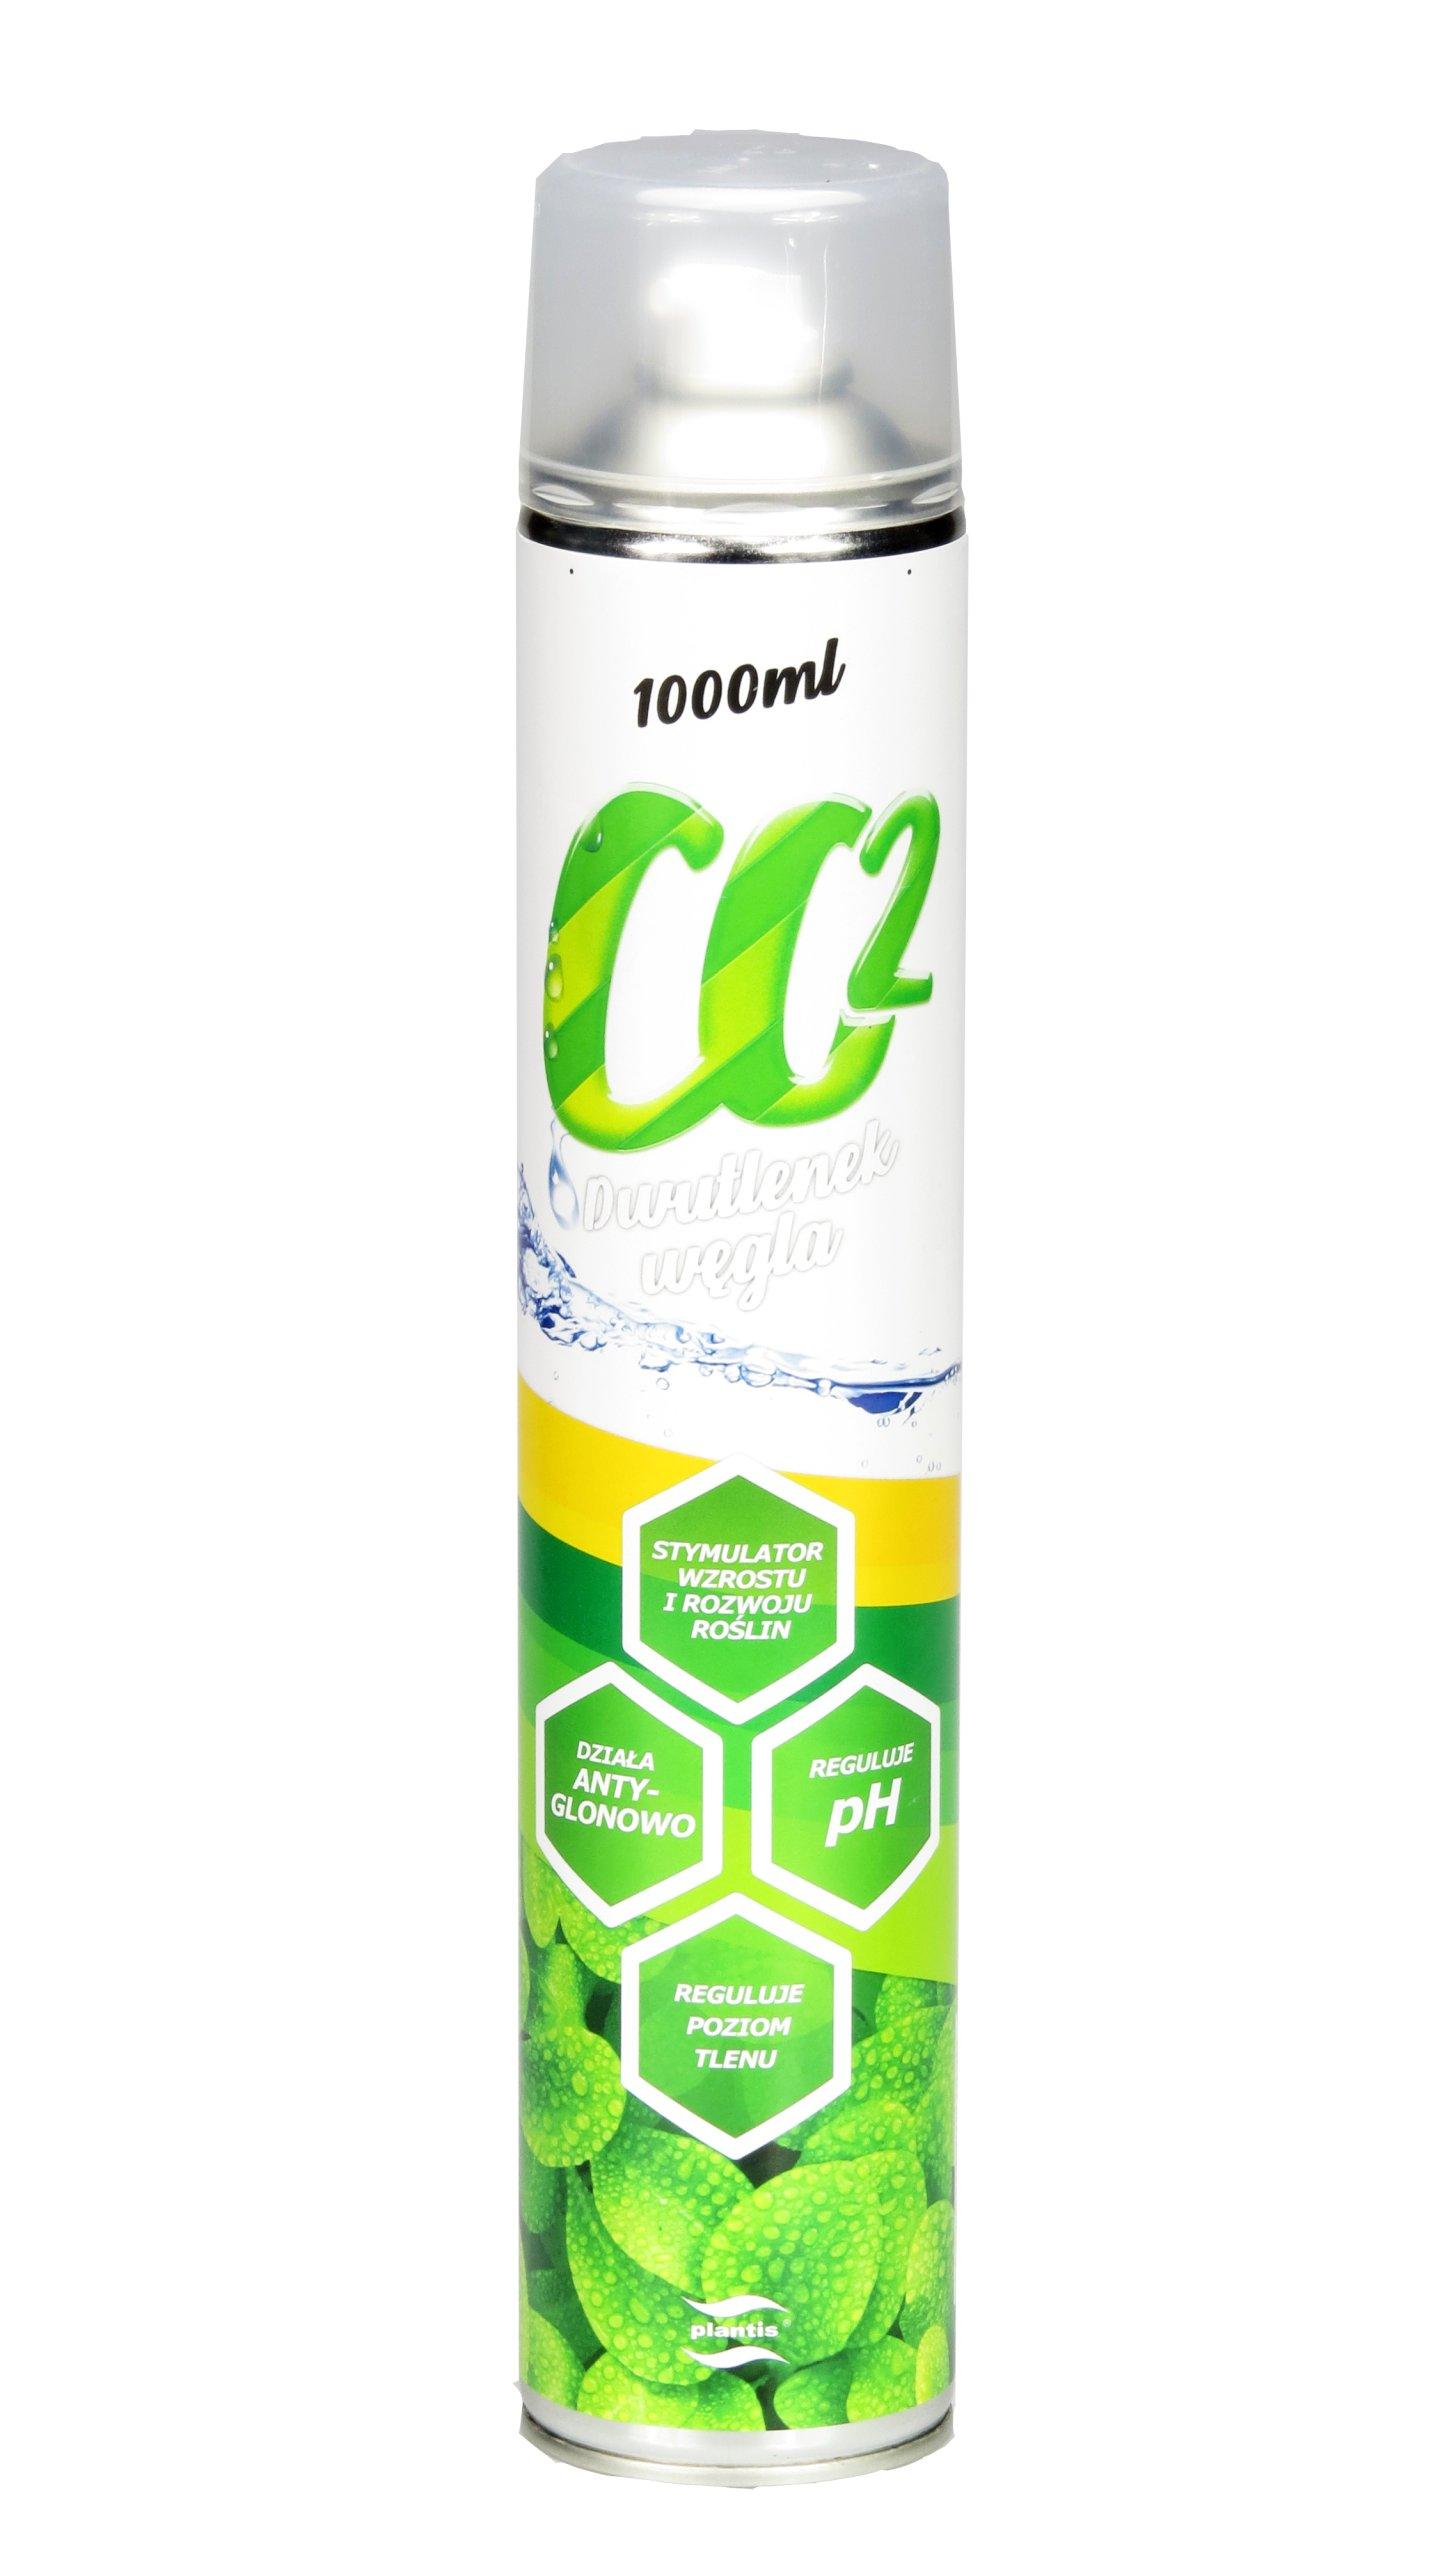 PLANTIS CO2 1x1000ml ЗАПАСНОЙ БАЛЛОН CO2